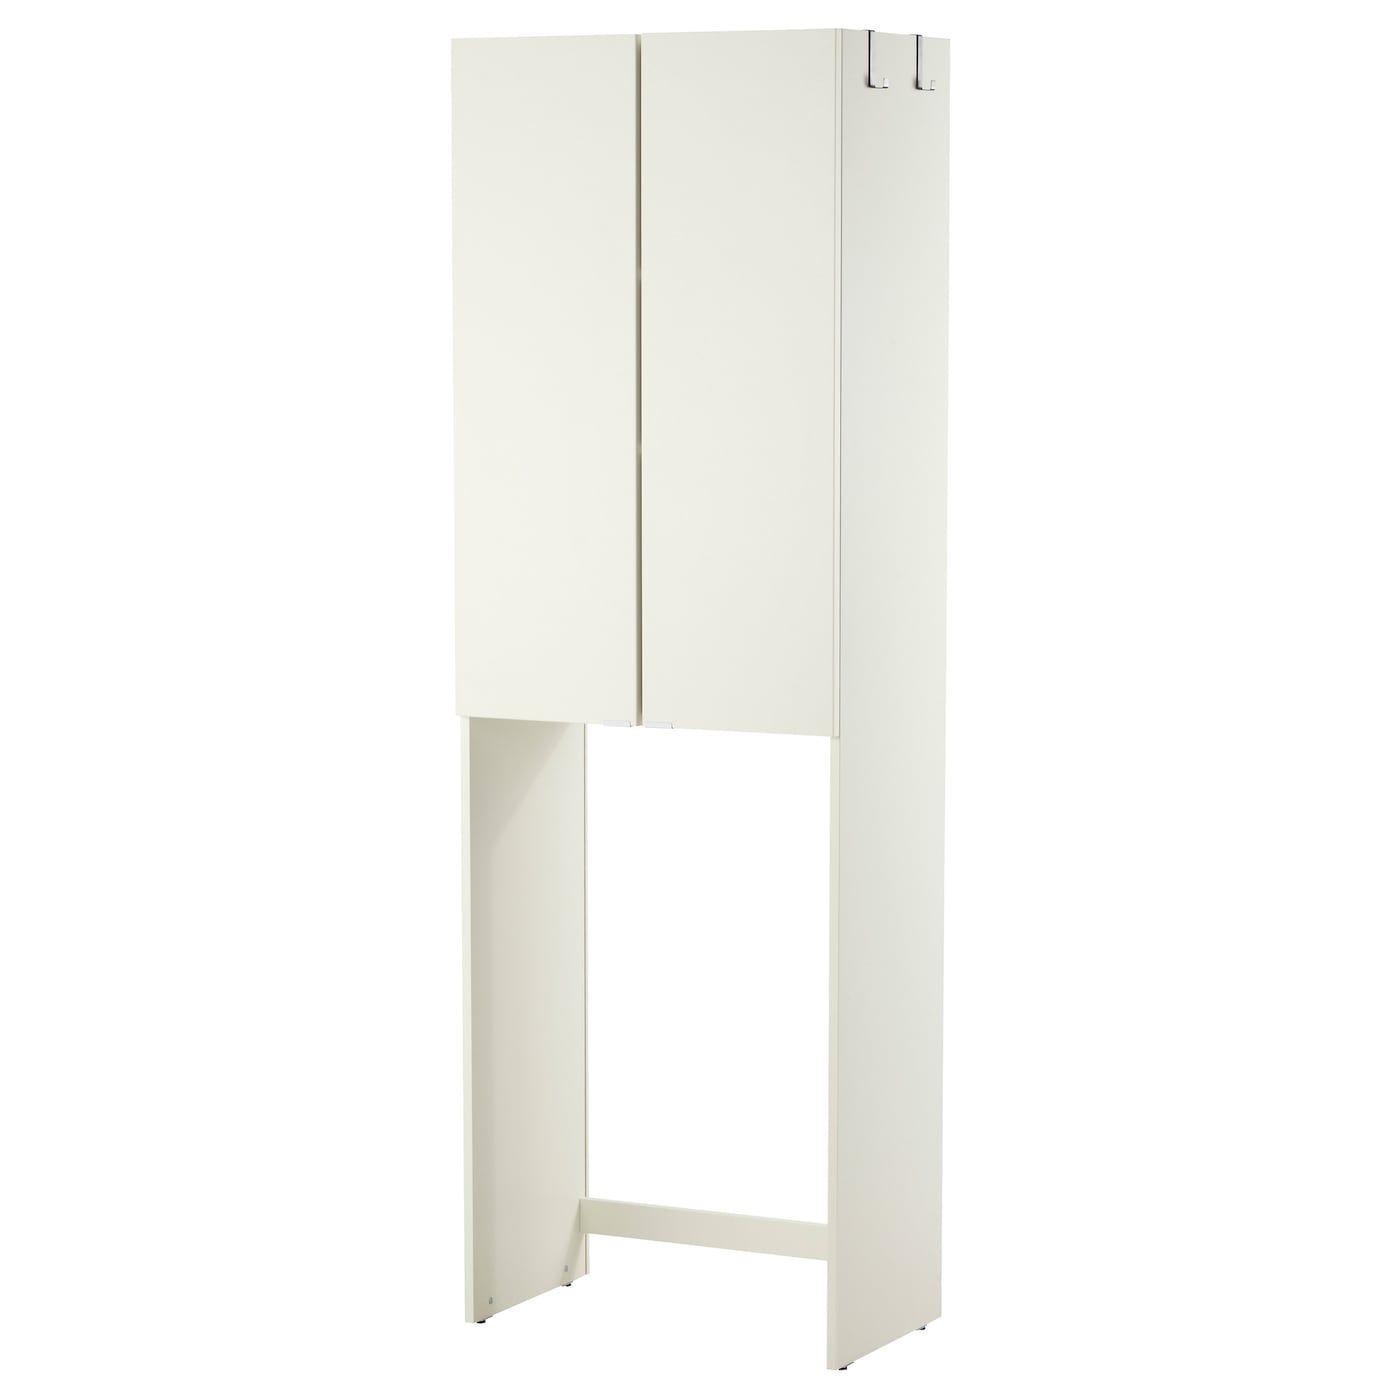 Lillangen Mobile Per Lavatrice Bianco 64x38x195 Cm Ikea It In 2020 Ikea Ikea Washing Machine Ikea Inspiration